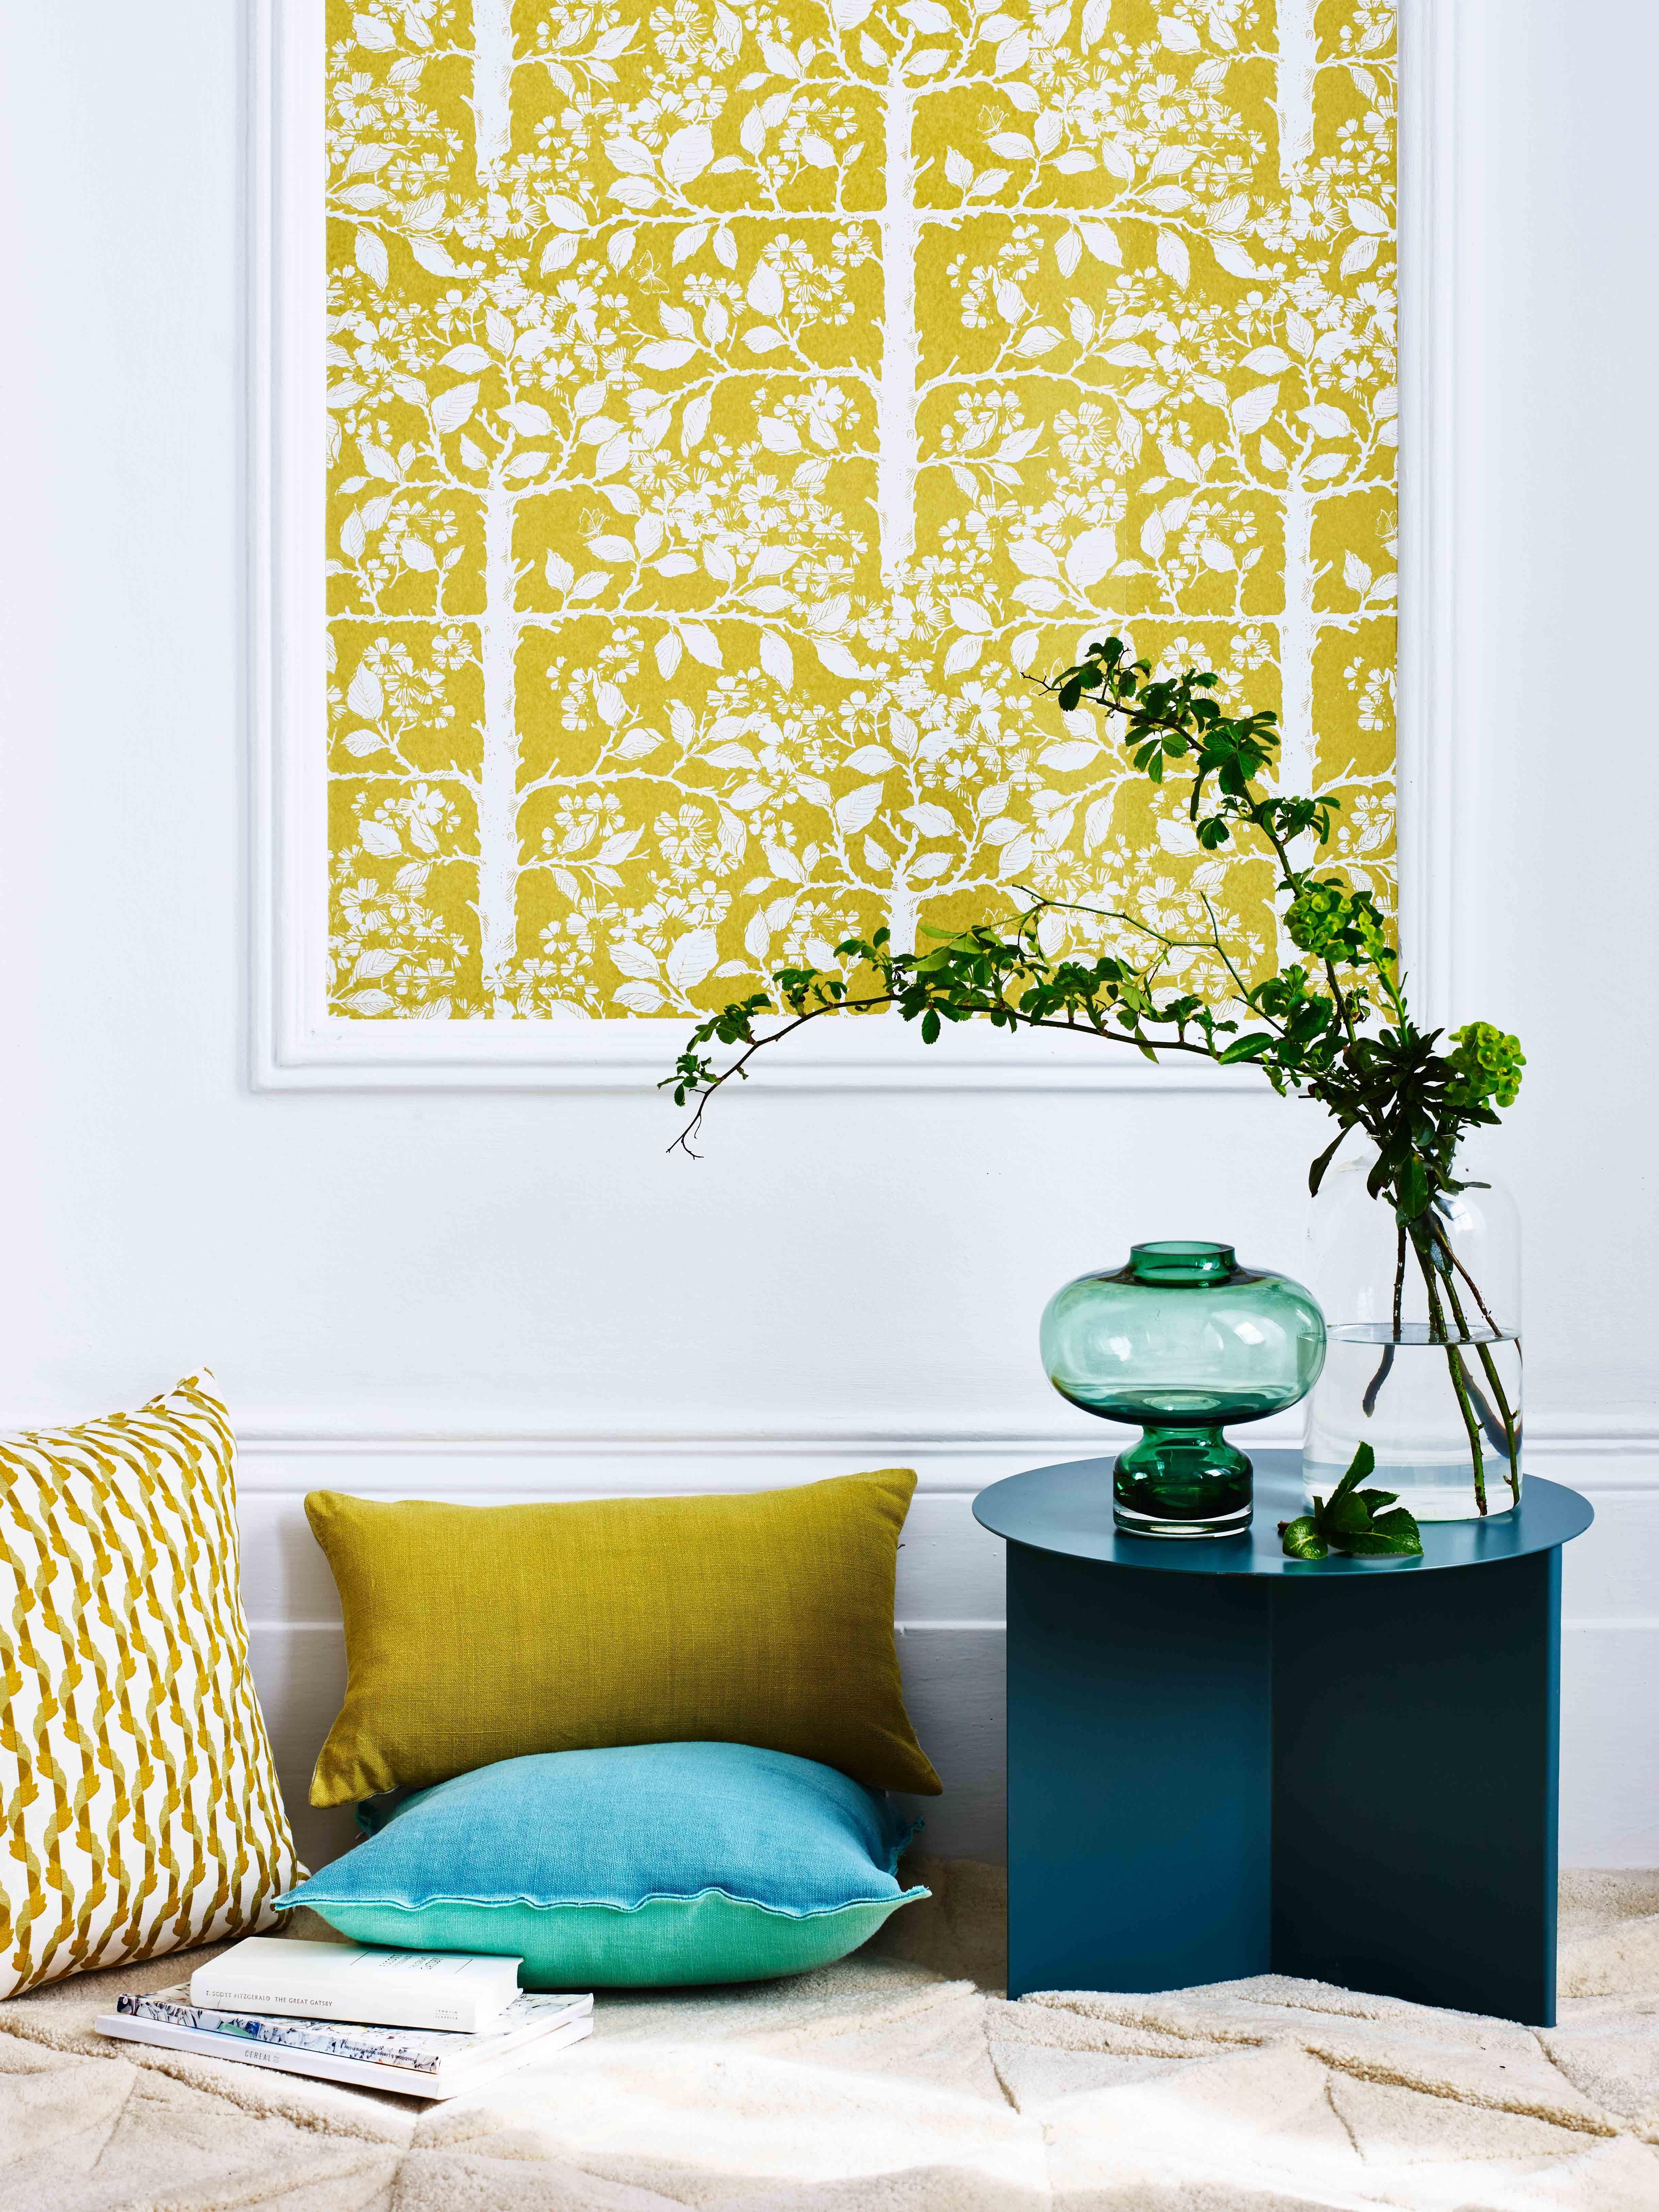 Tree Bedroom Wall Mural Picturesque Walled | www.picturesboss.com